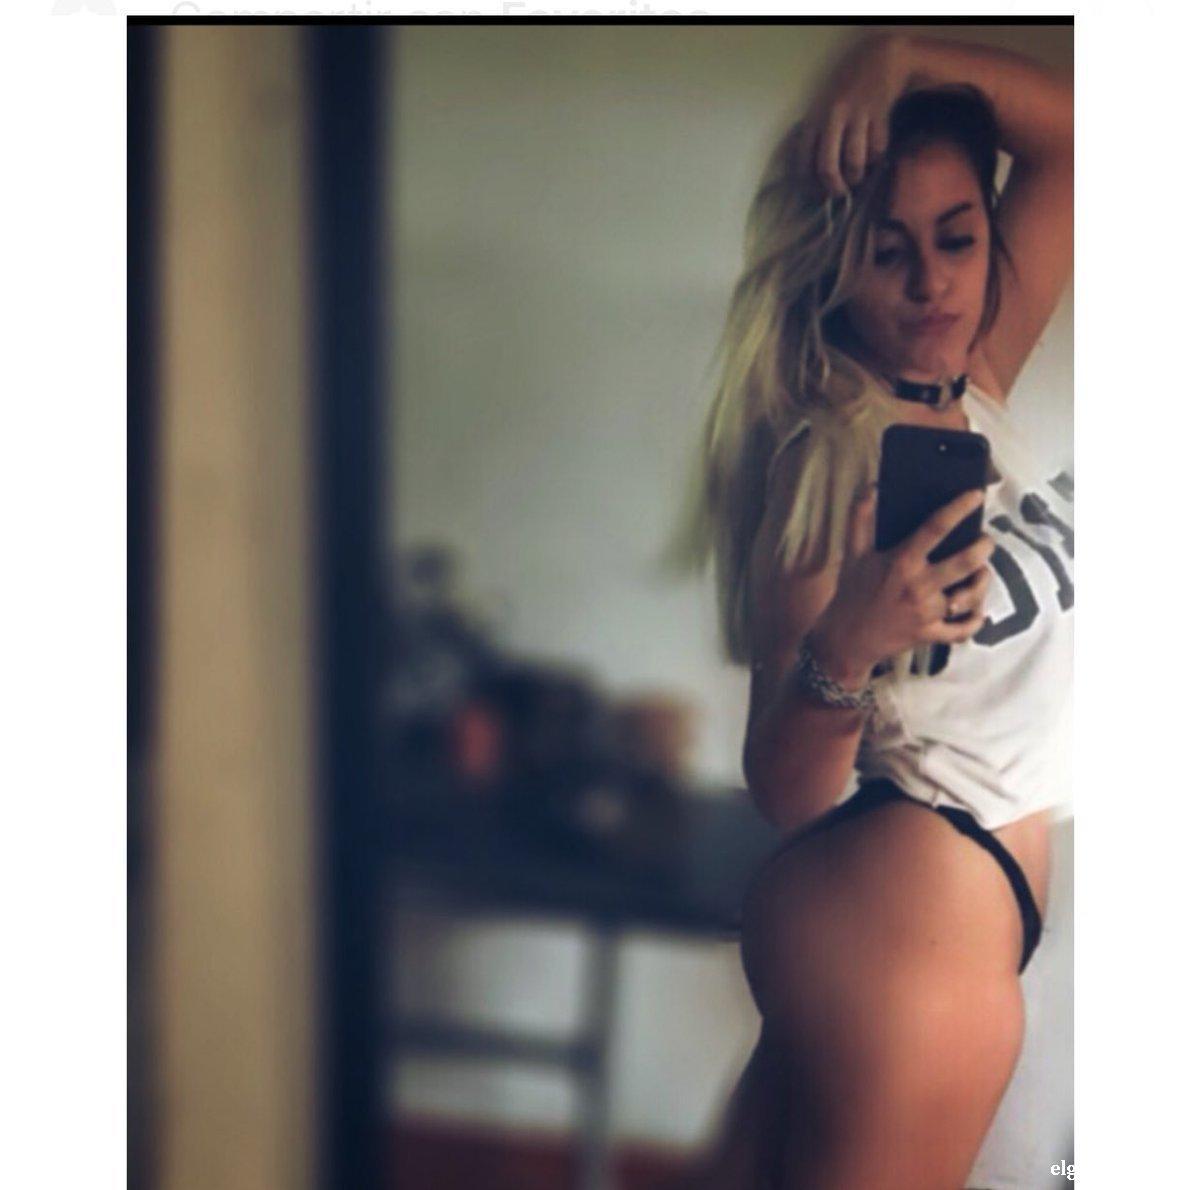 putas de instagram qué